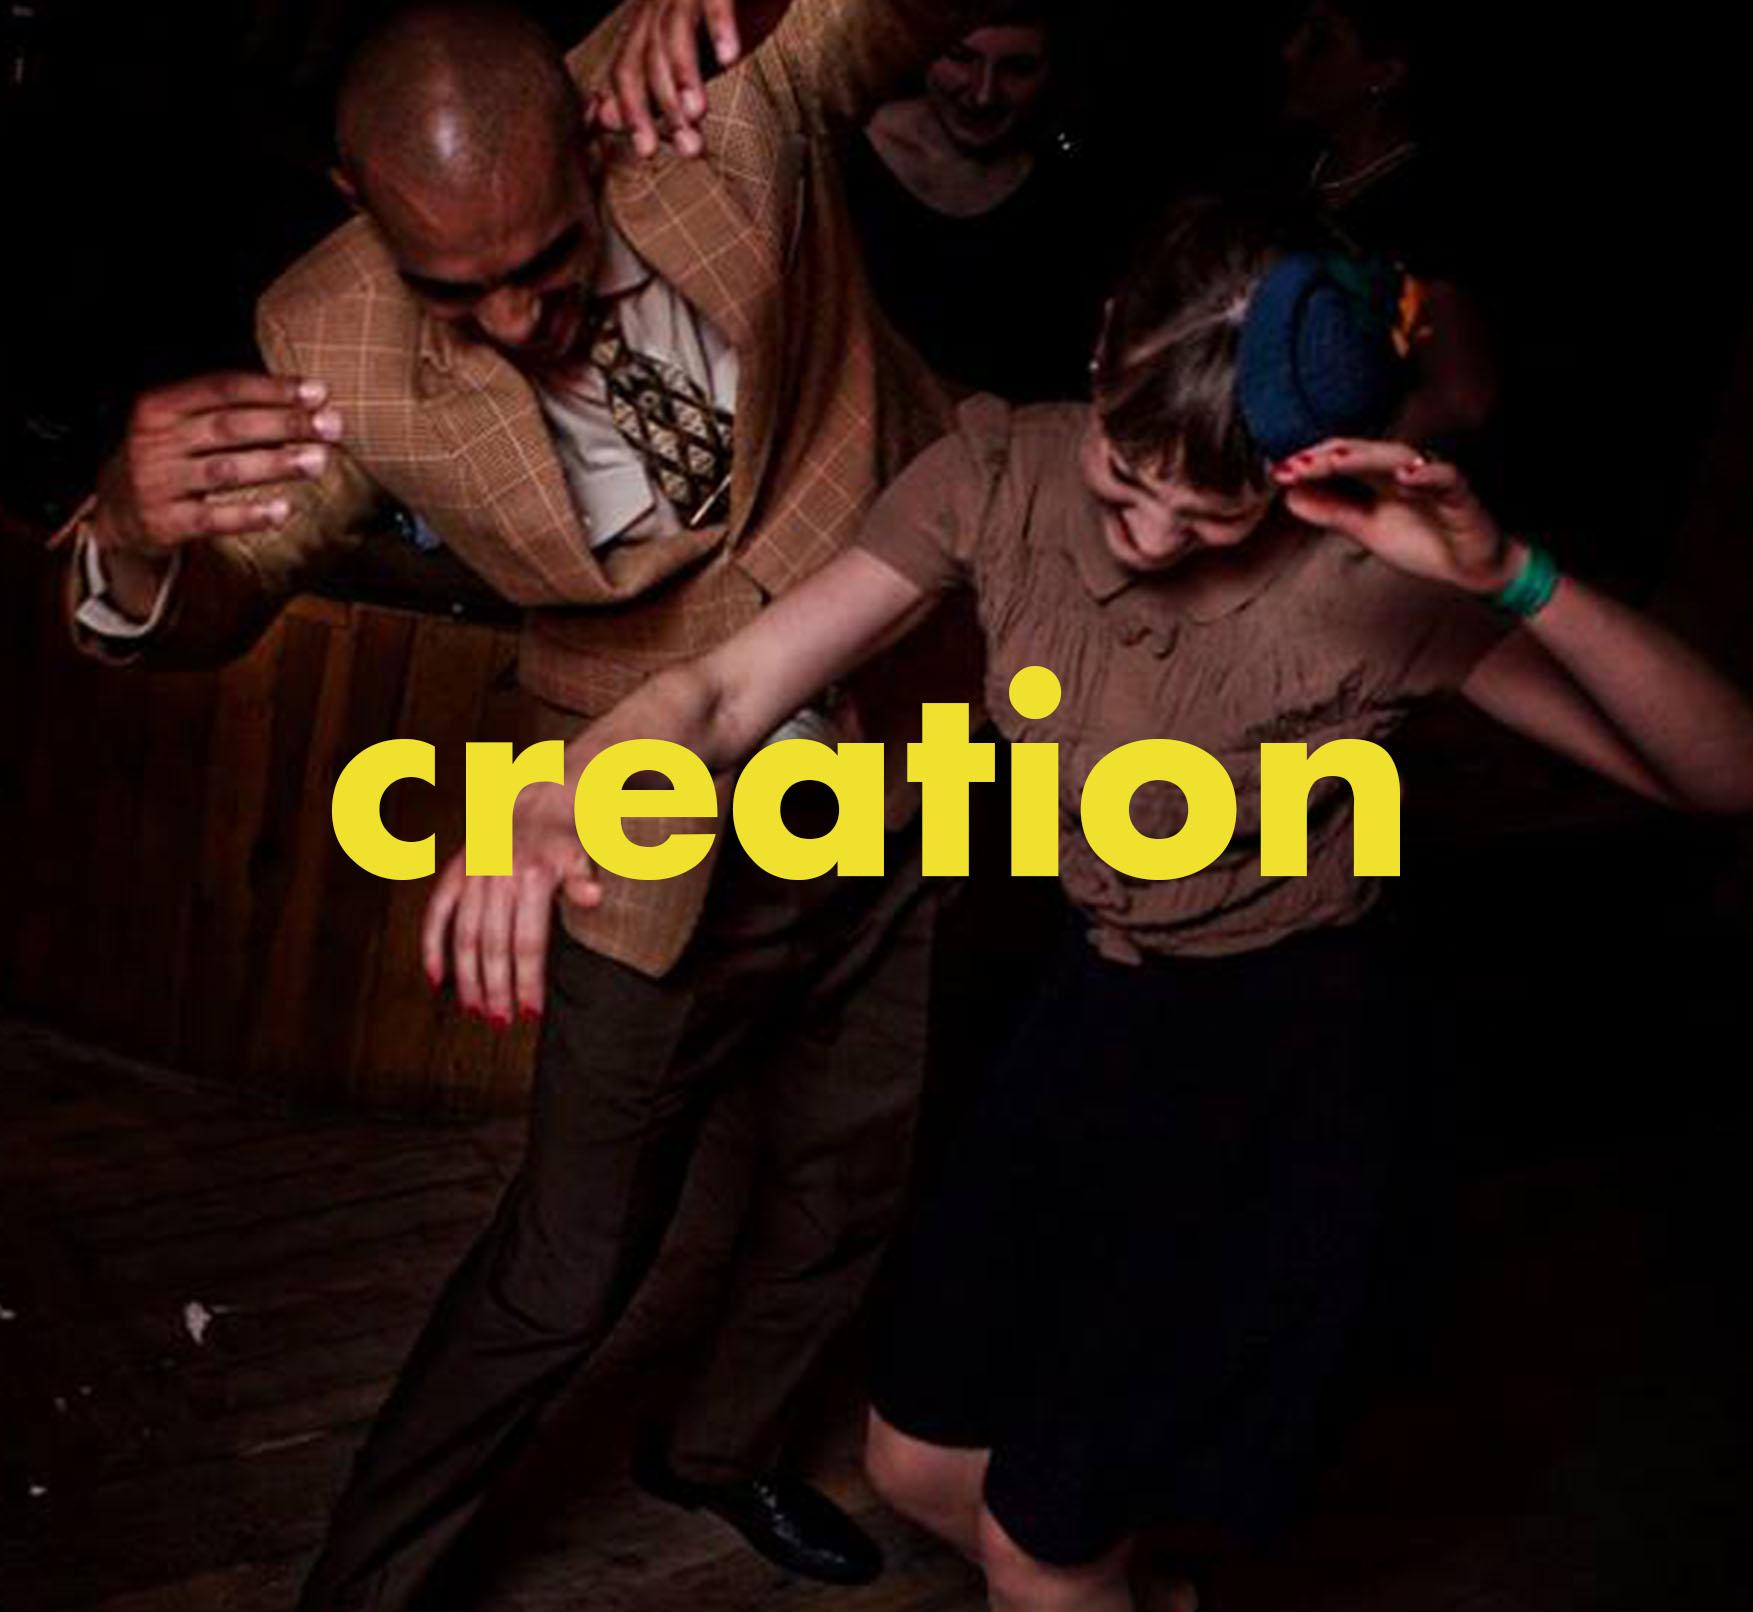 mo-creation.jpg